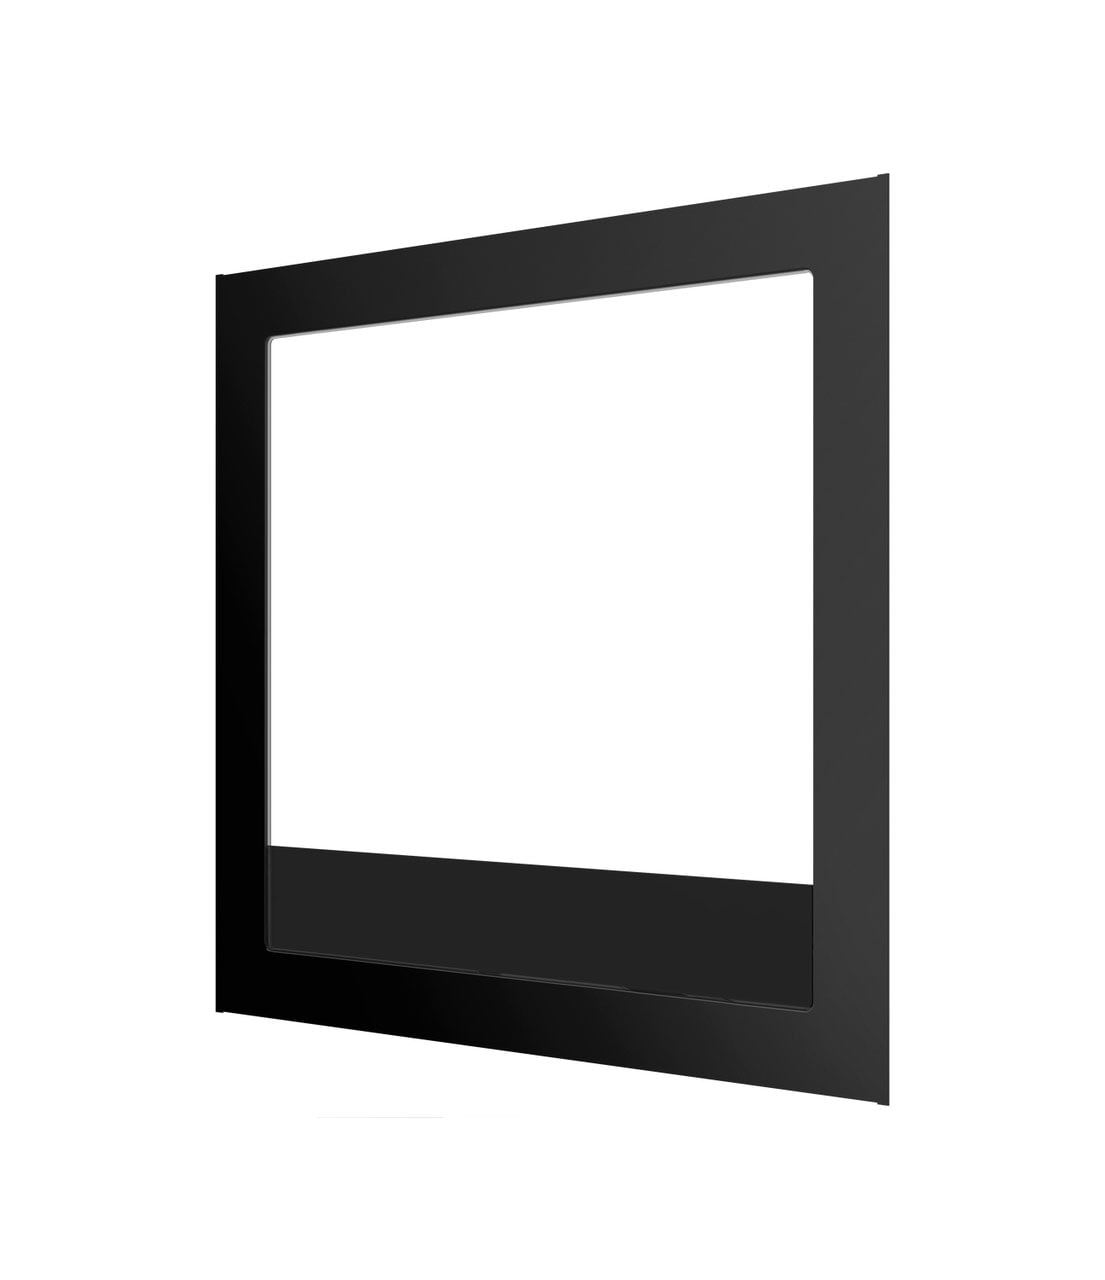 Cooler Master MasterCase 5 Side Window Kit (MCA-0005-KWN00) - Achat / Vente Accessoire boîtier sur Cybertek.fr - 0